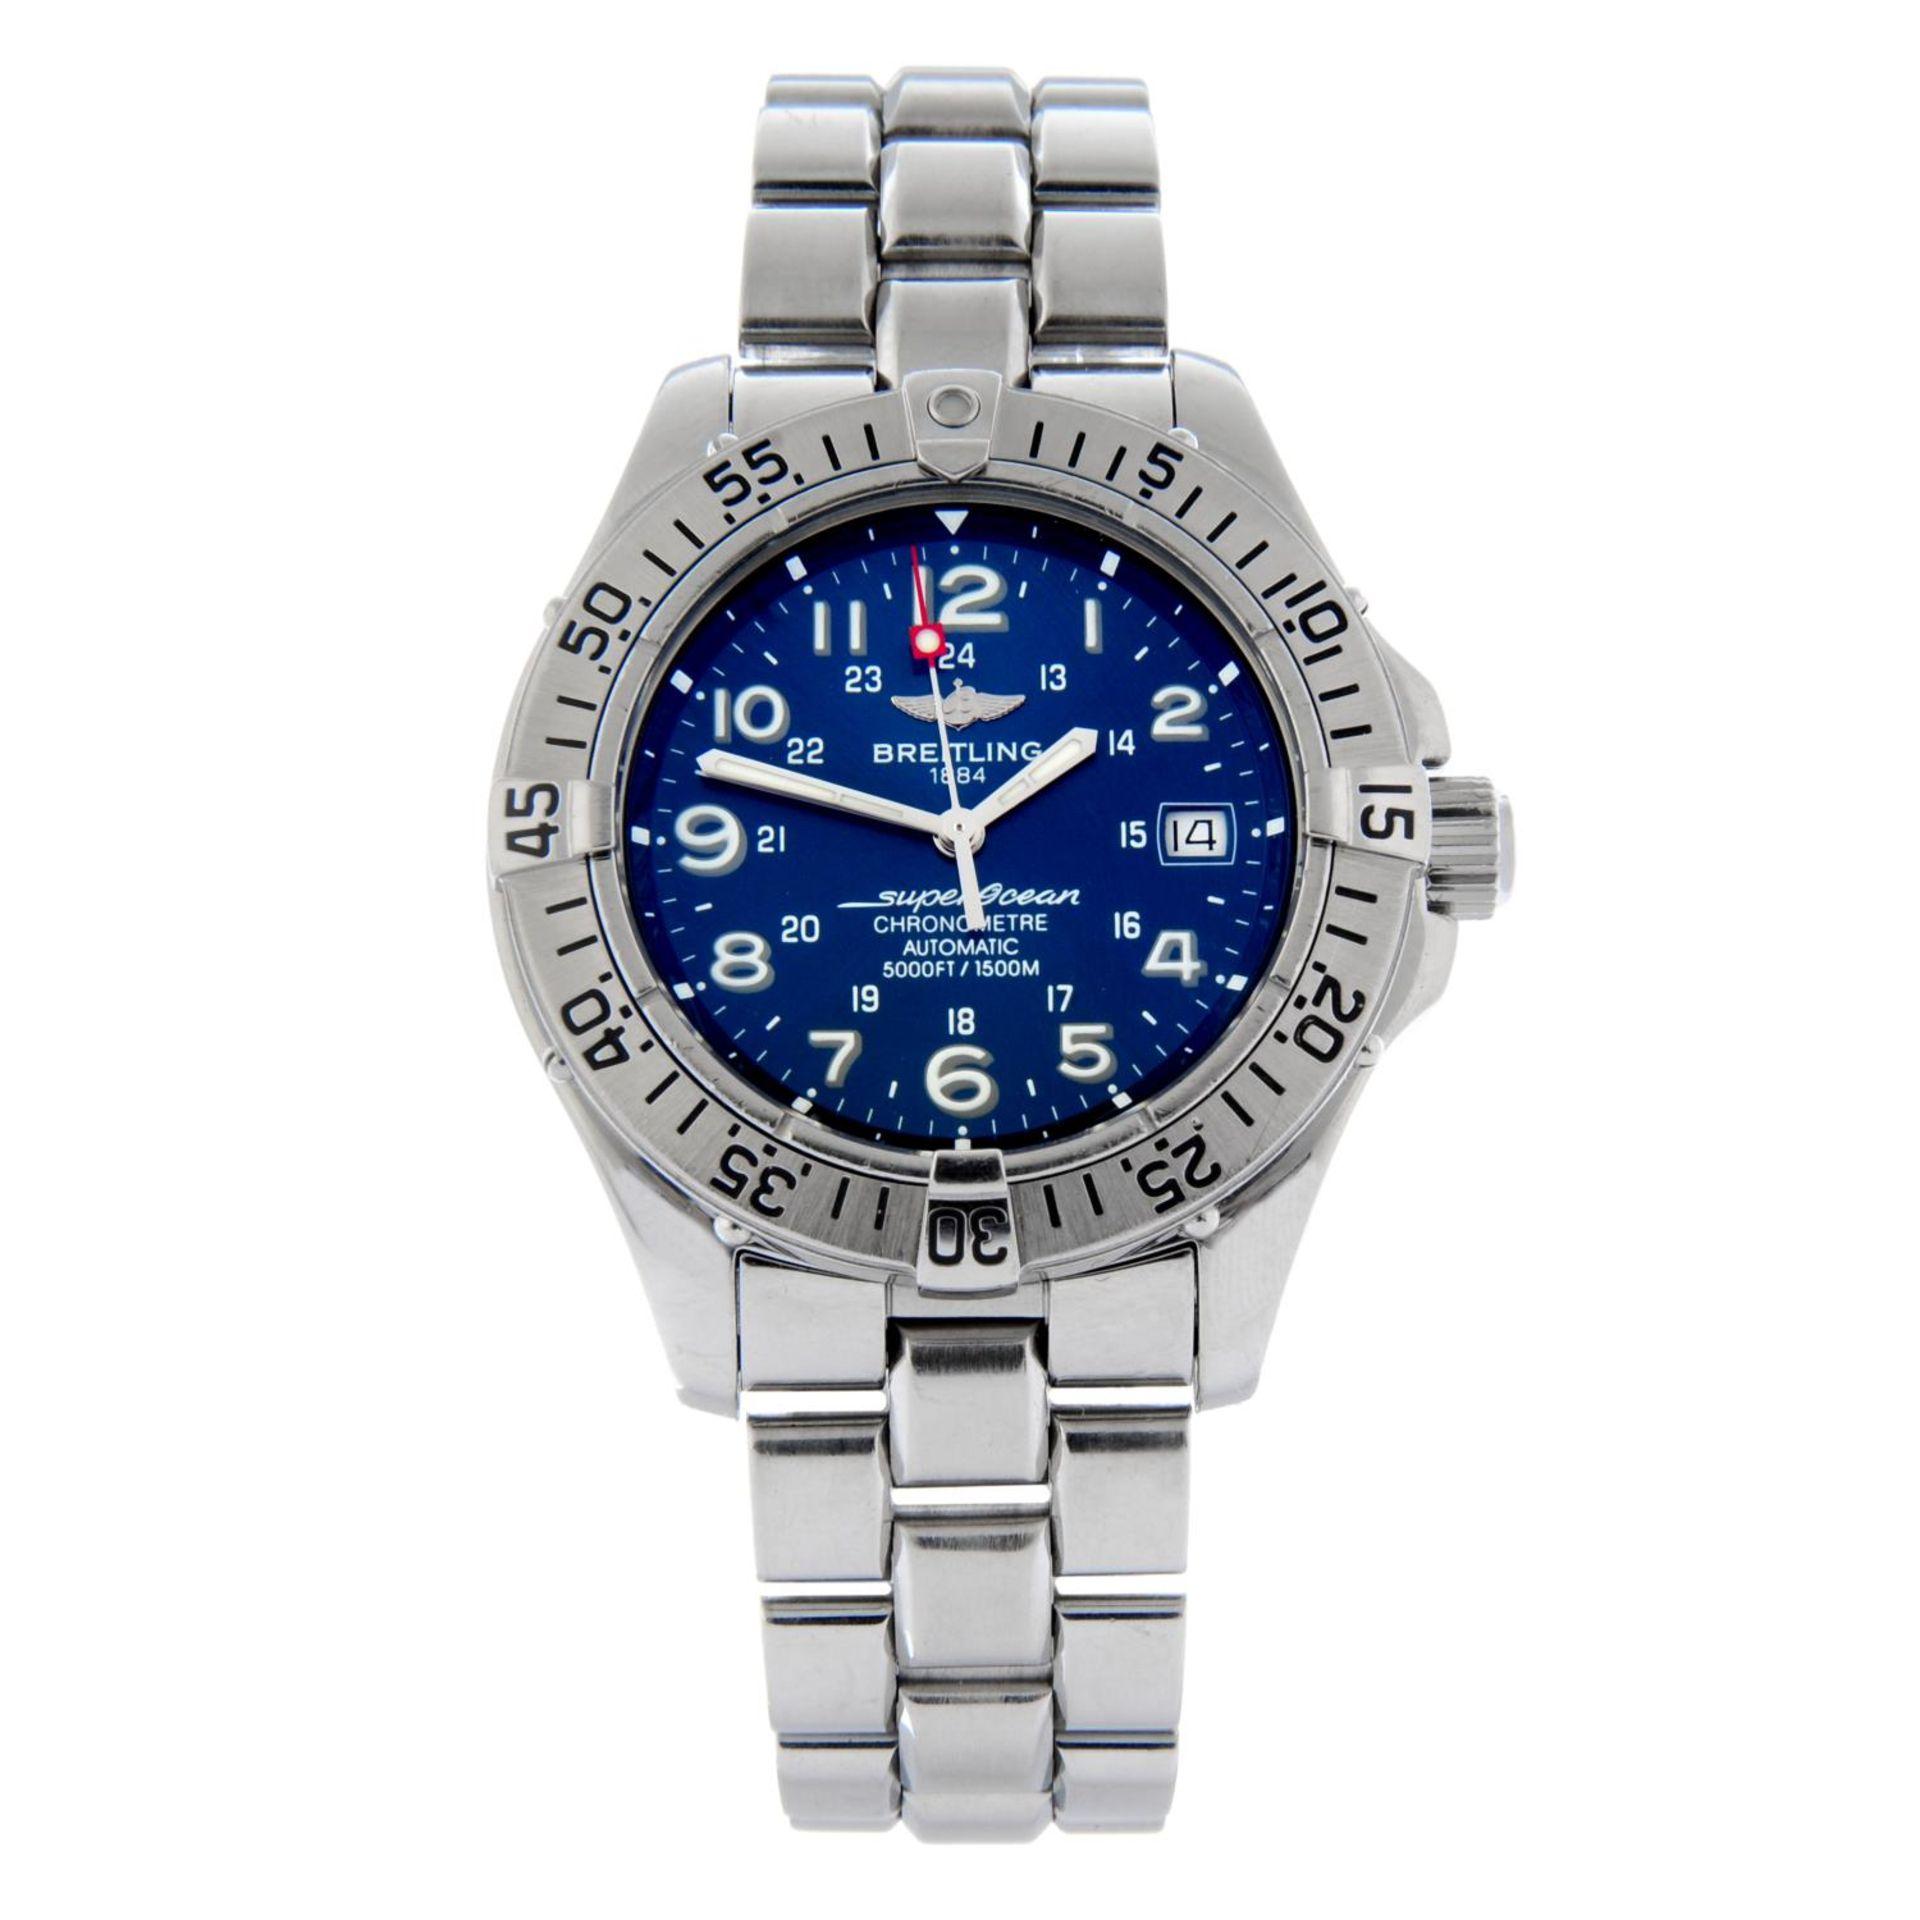 BREITLING - a SuperOcean bracelet watch.